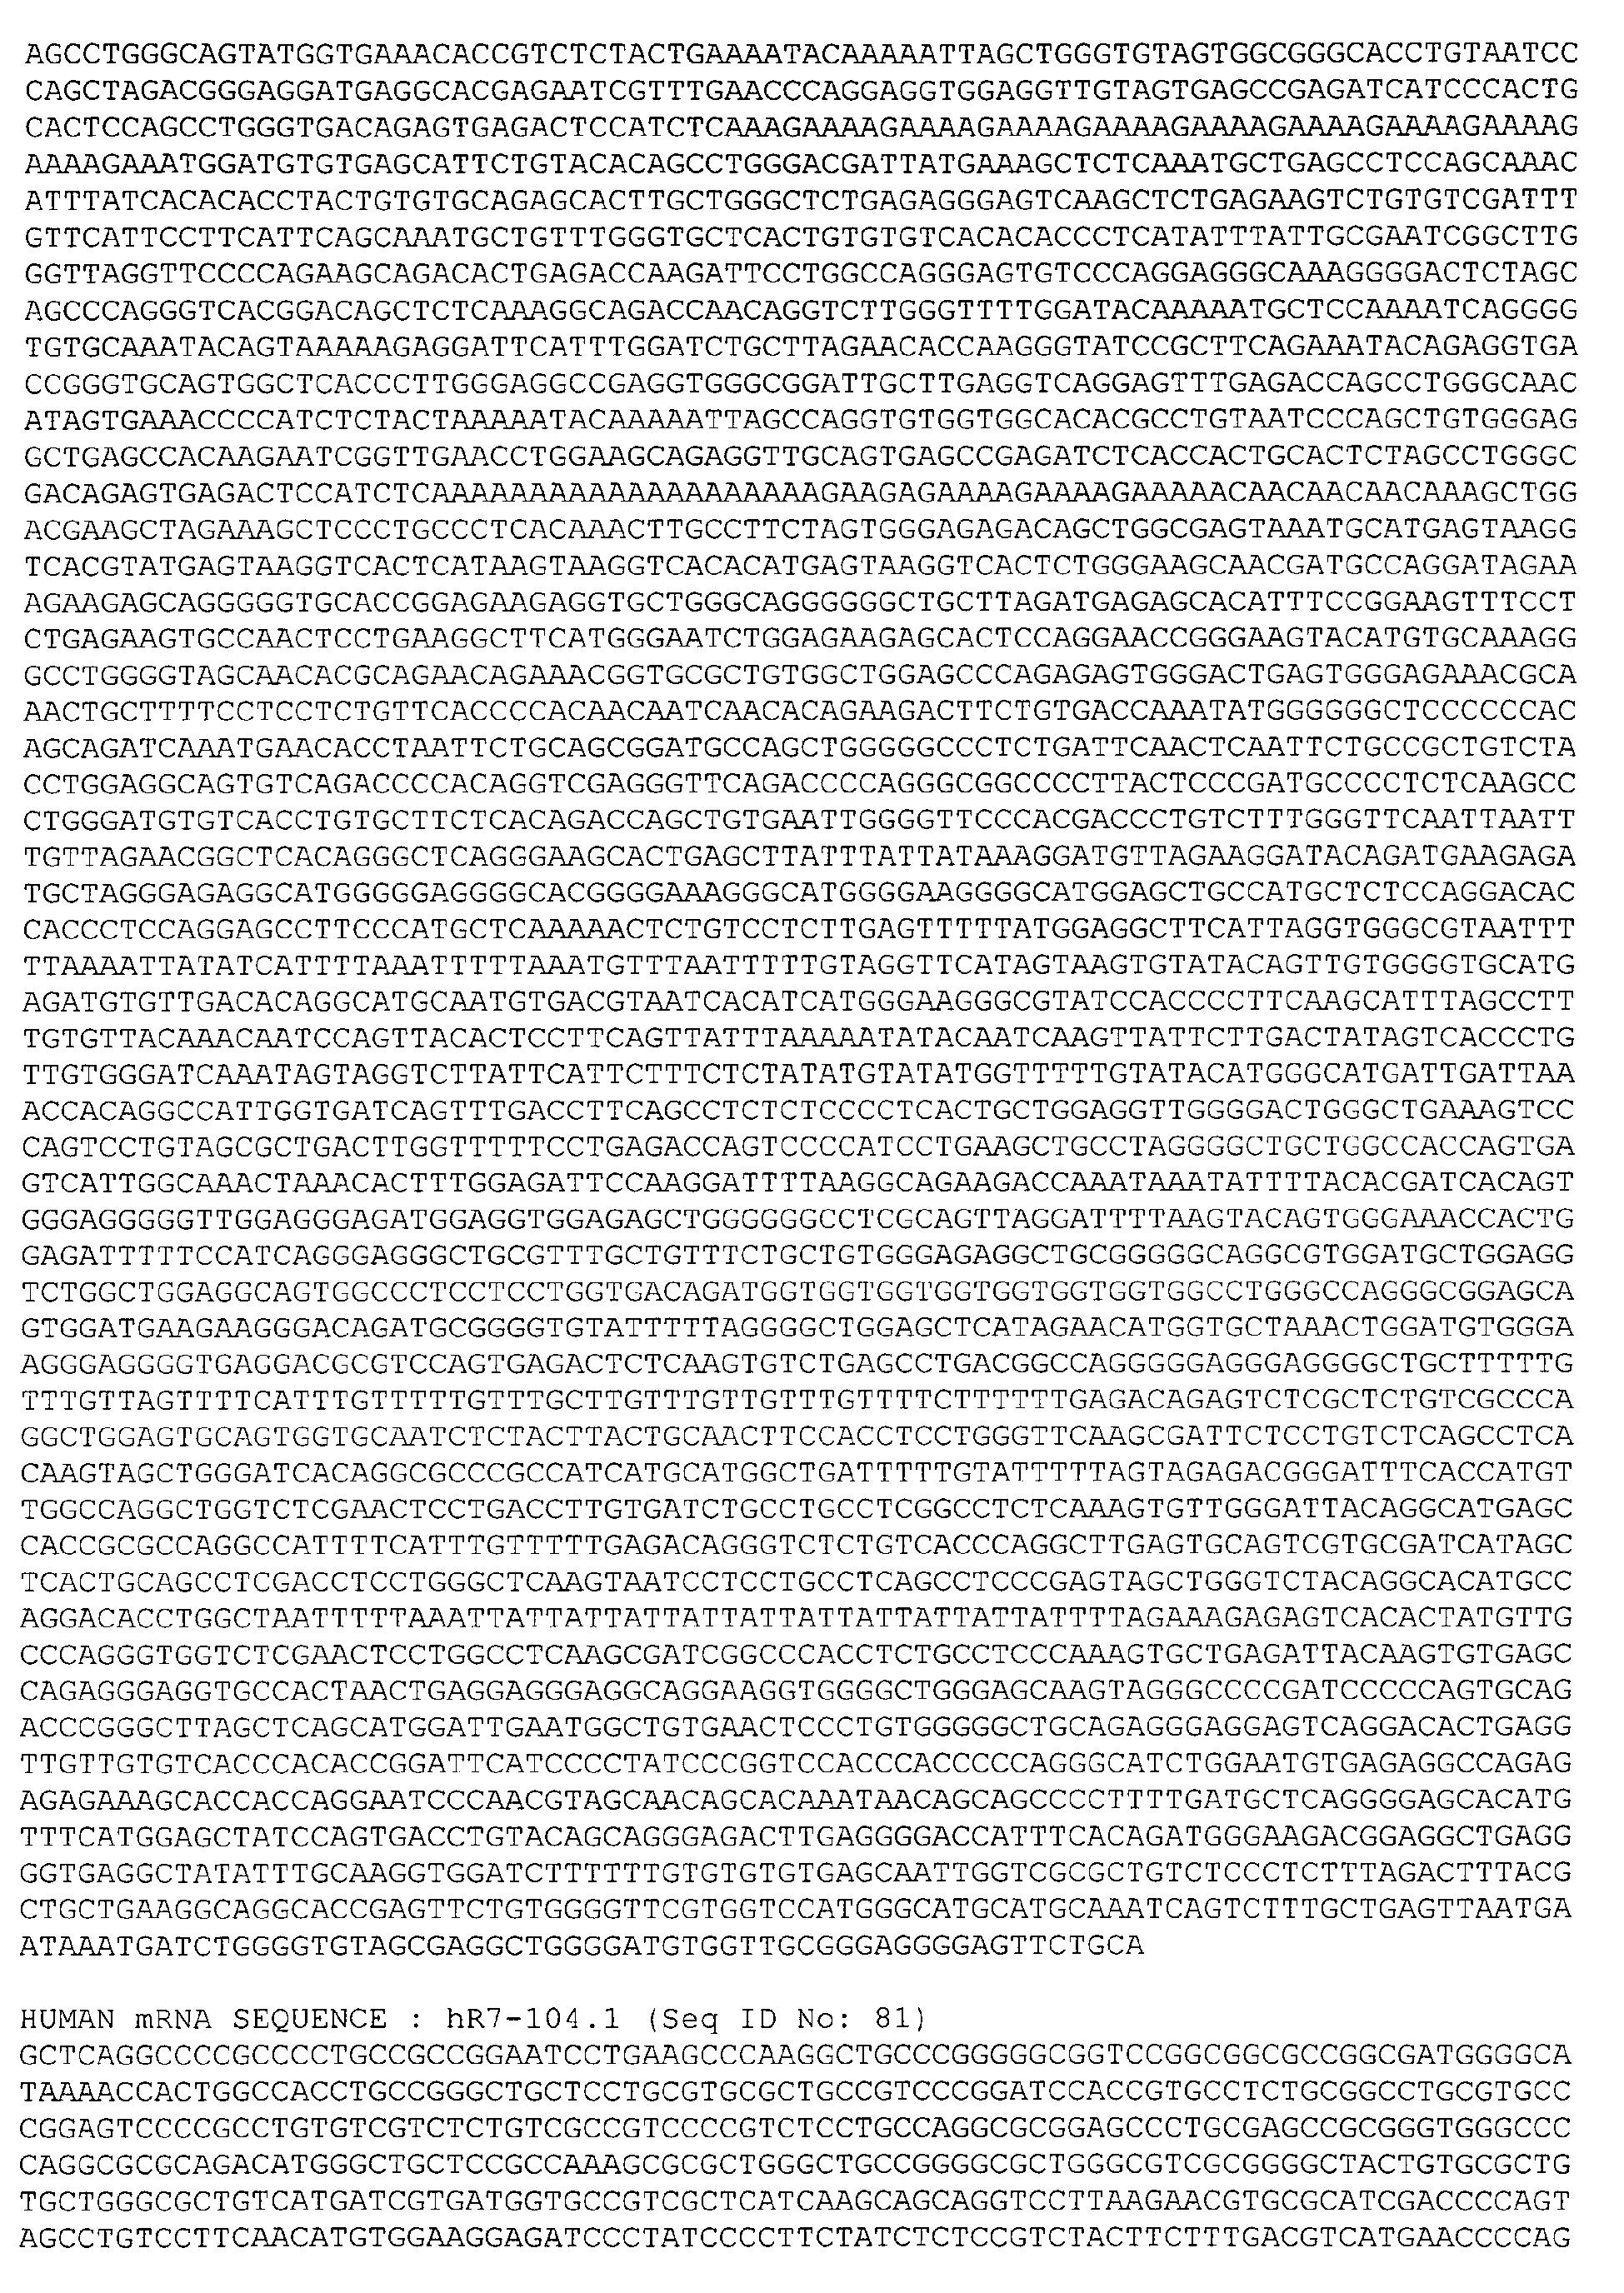 Figure imgb0273